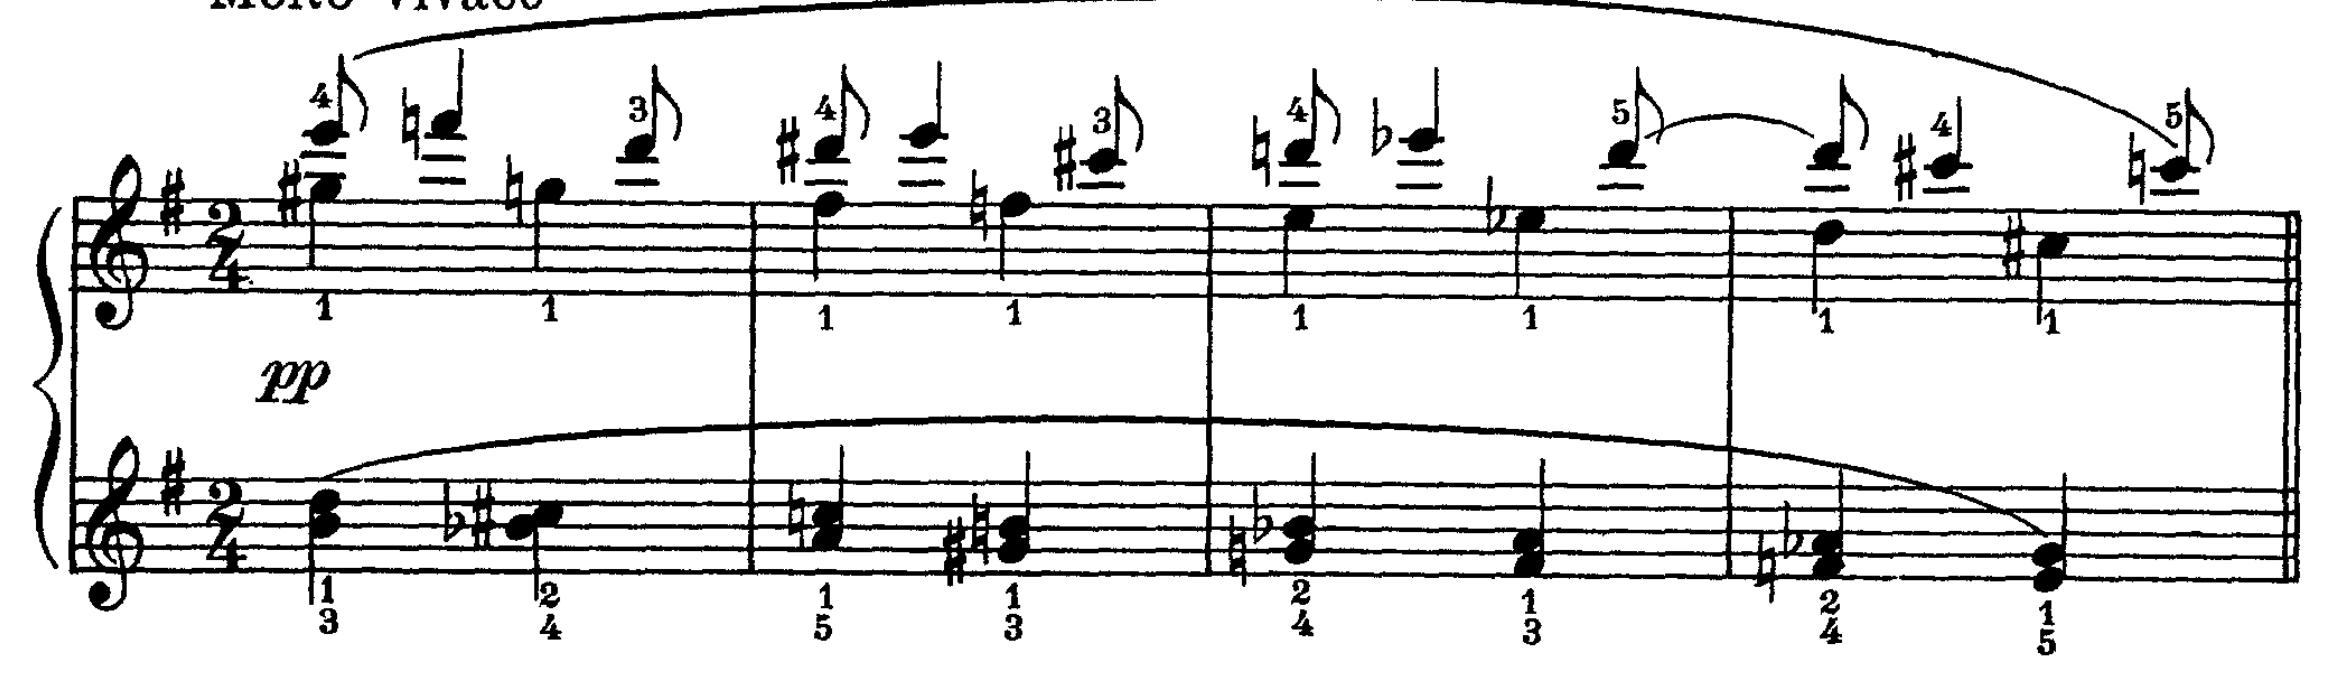 mm. 1 - 4